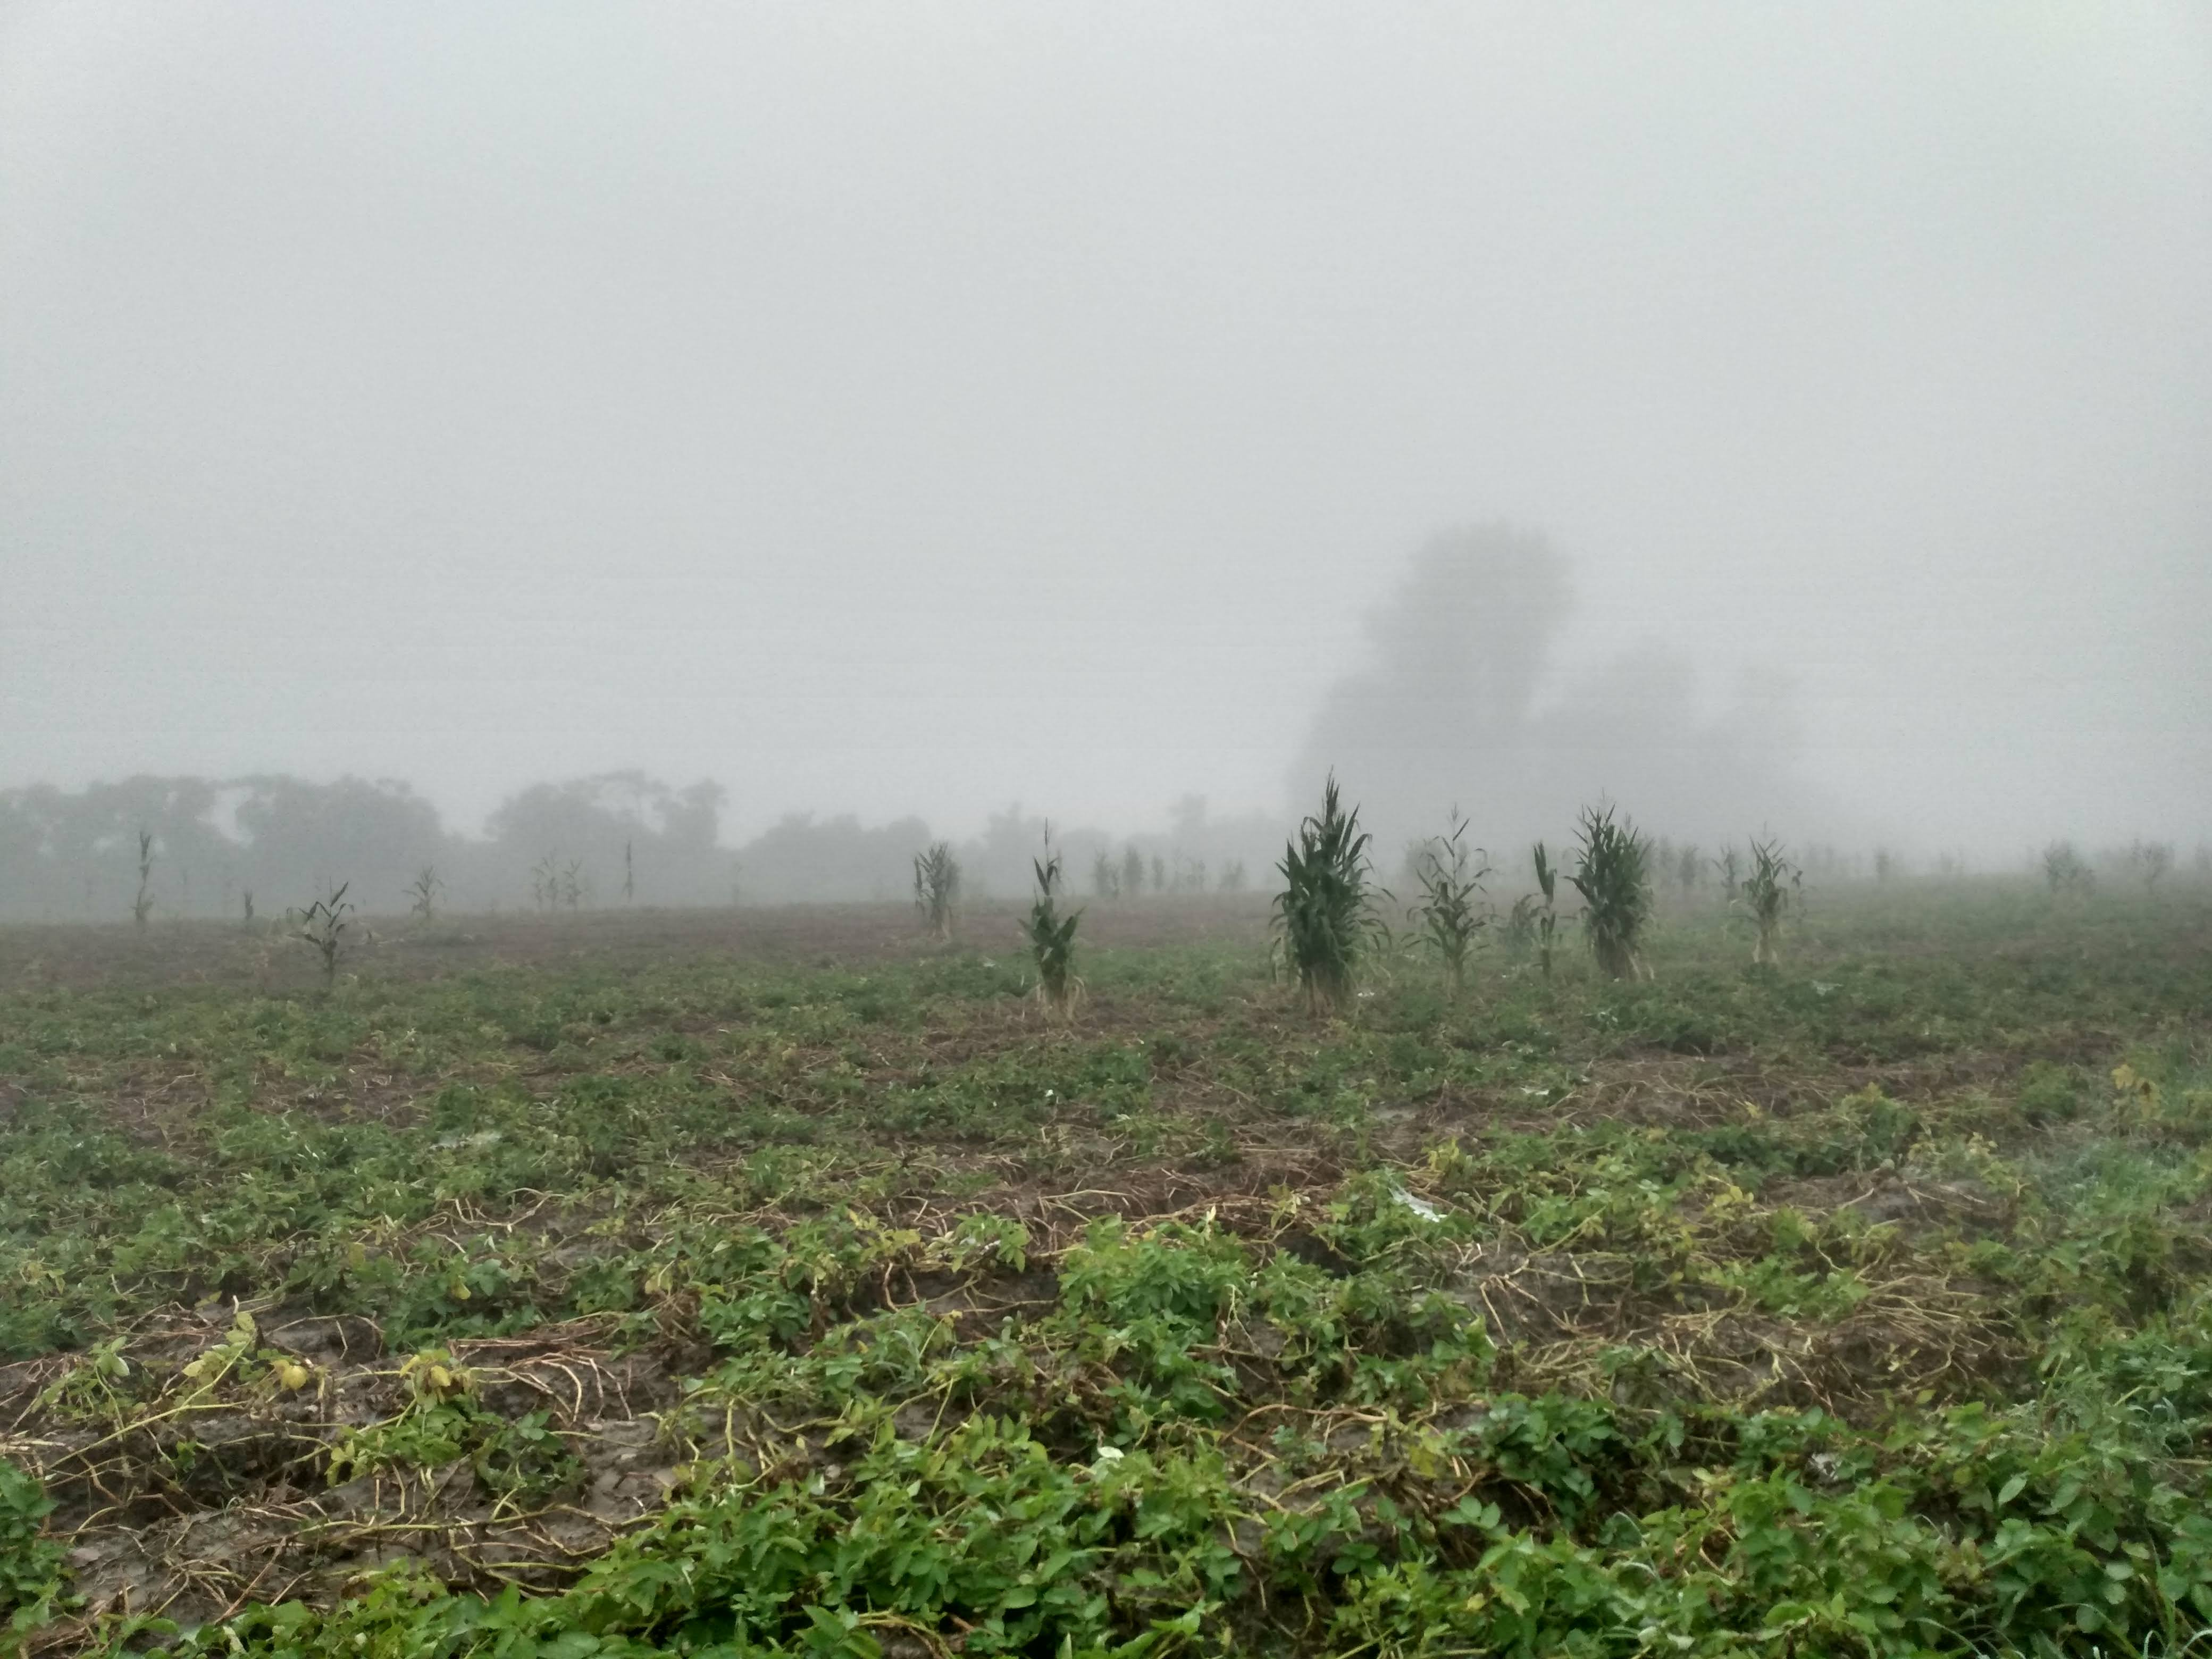 misty potato field with corn stalks